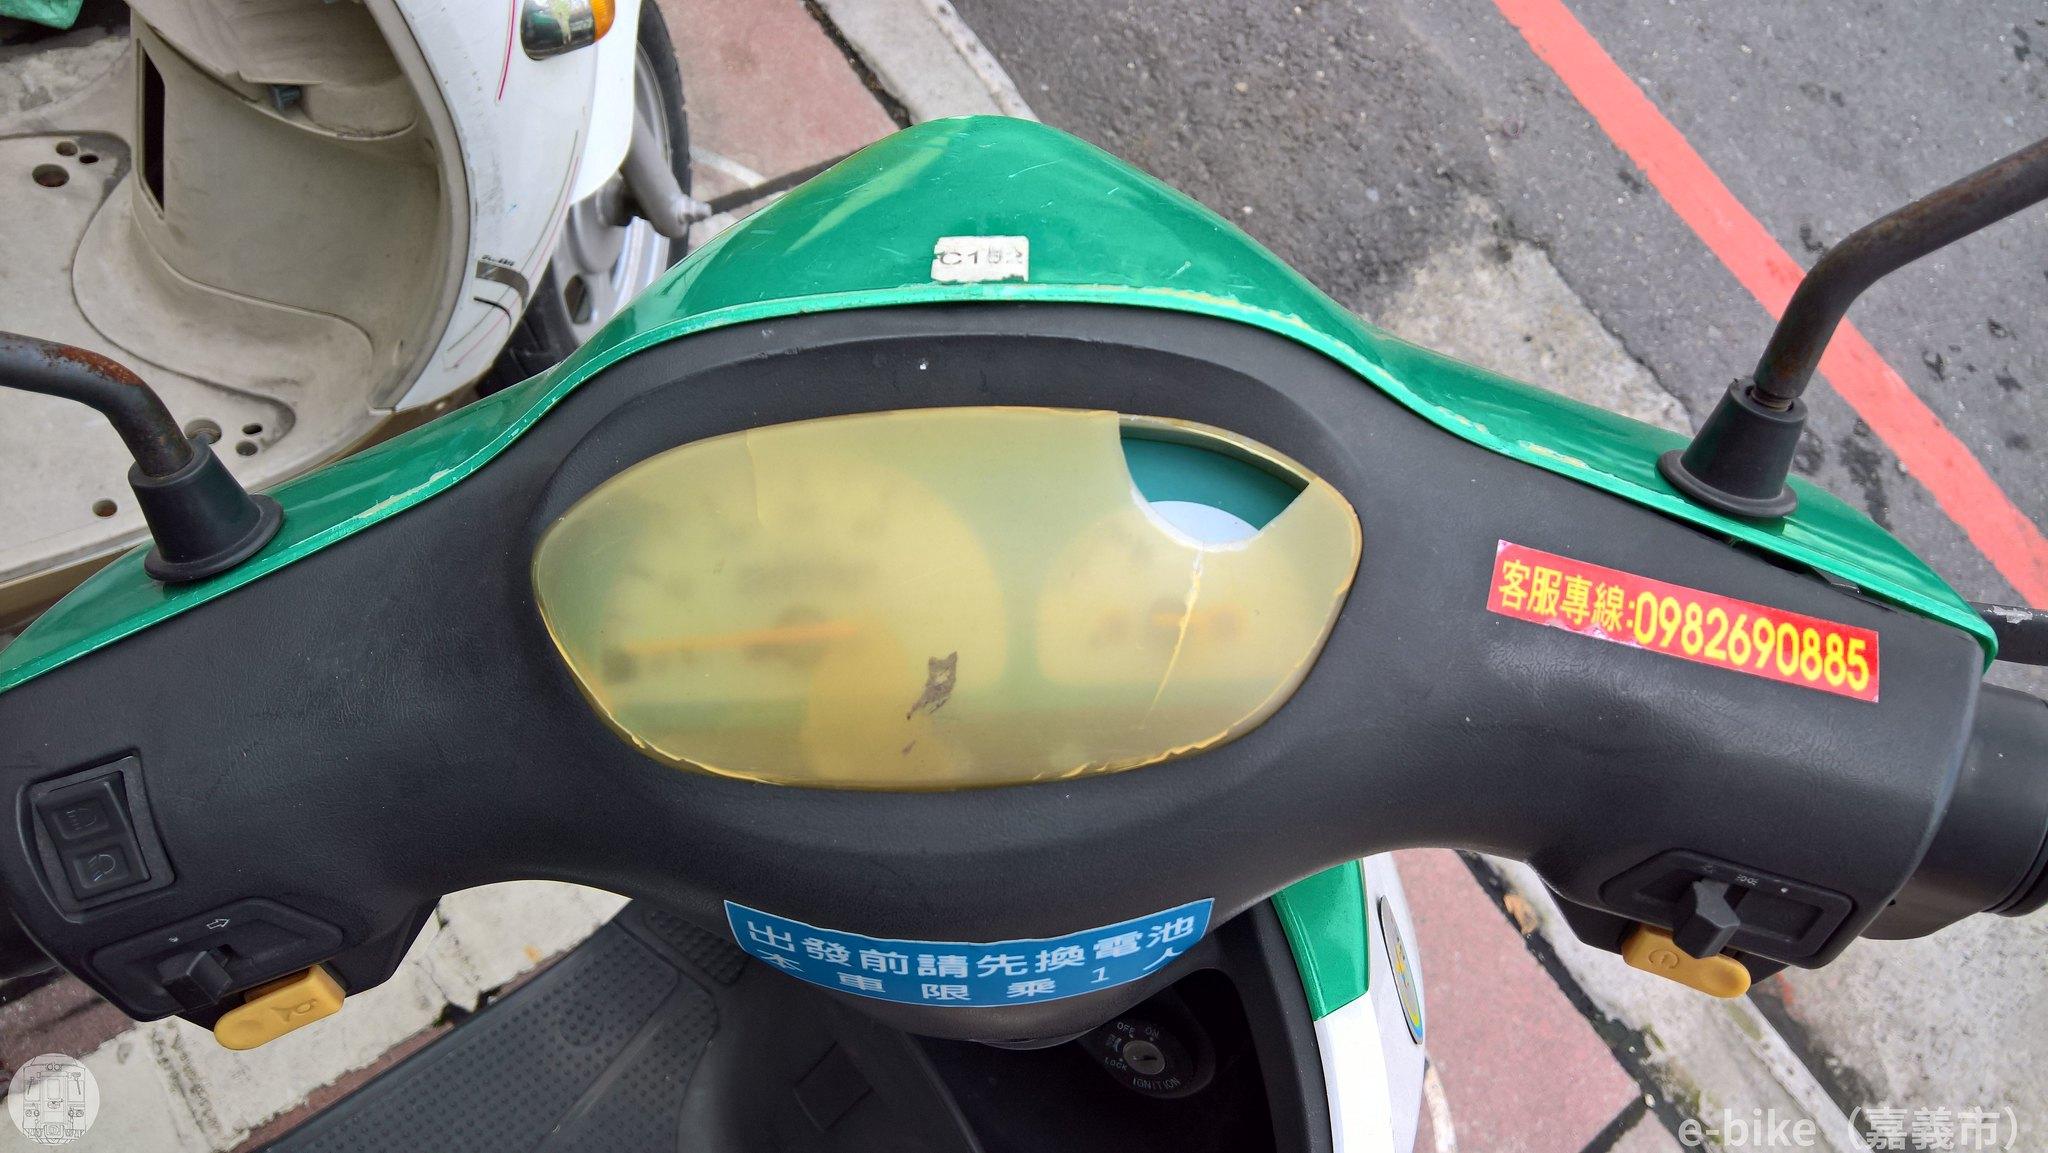 嘉義市 e-bike